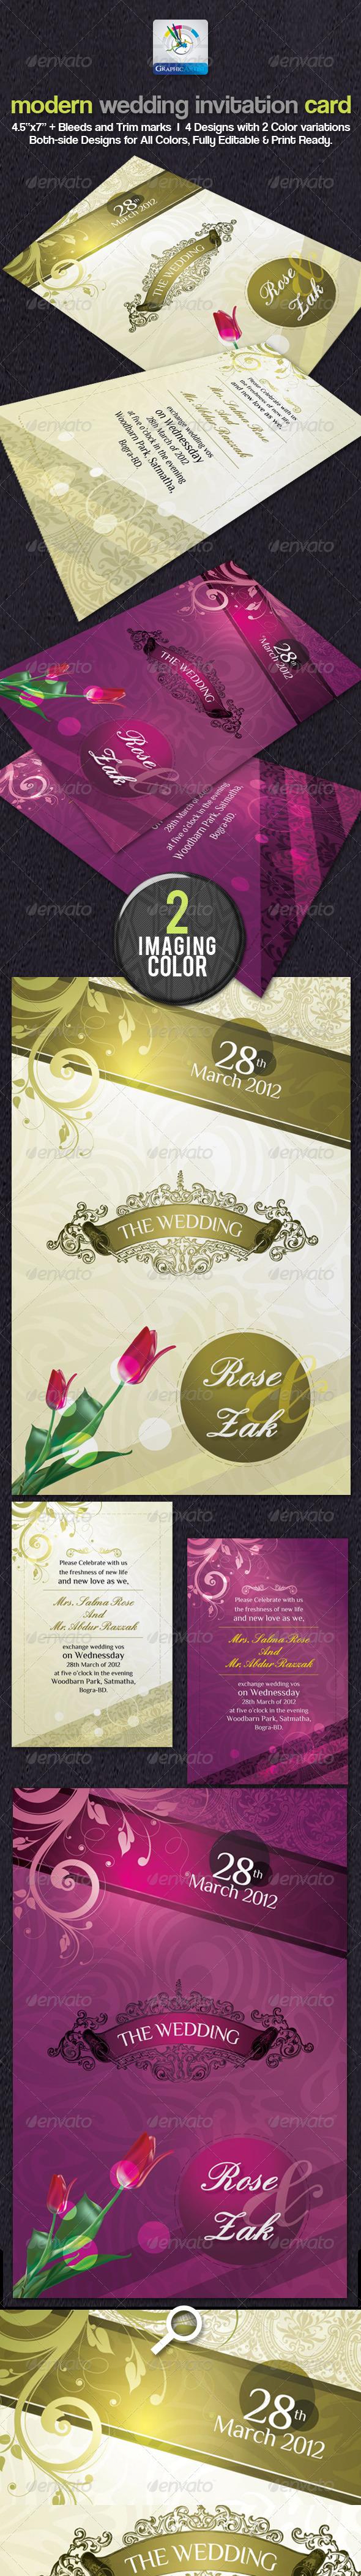 GraphicRiver Modern Wedding Invitation Cards 2393750